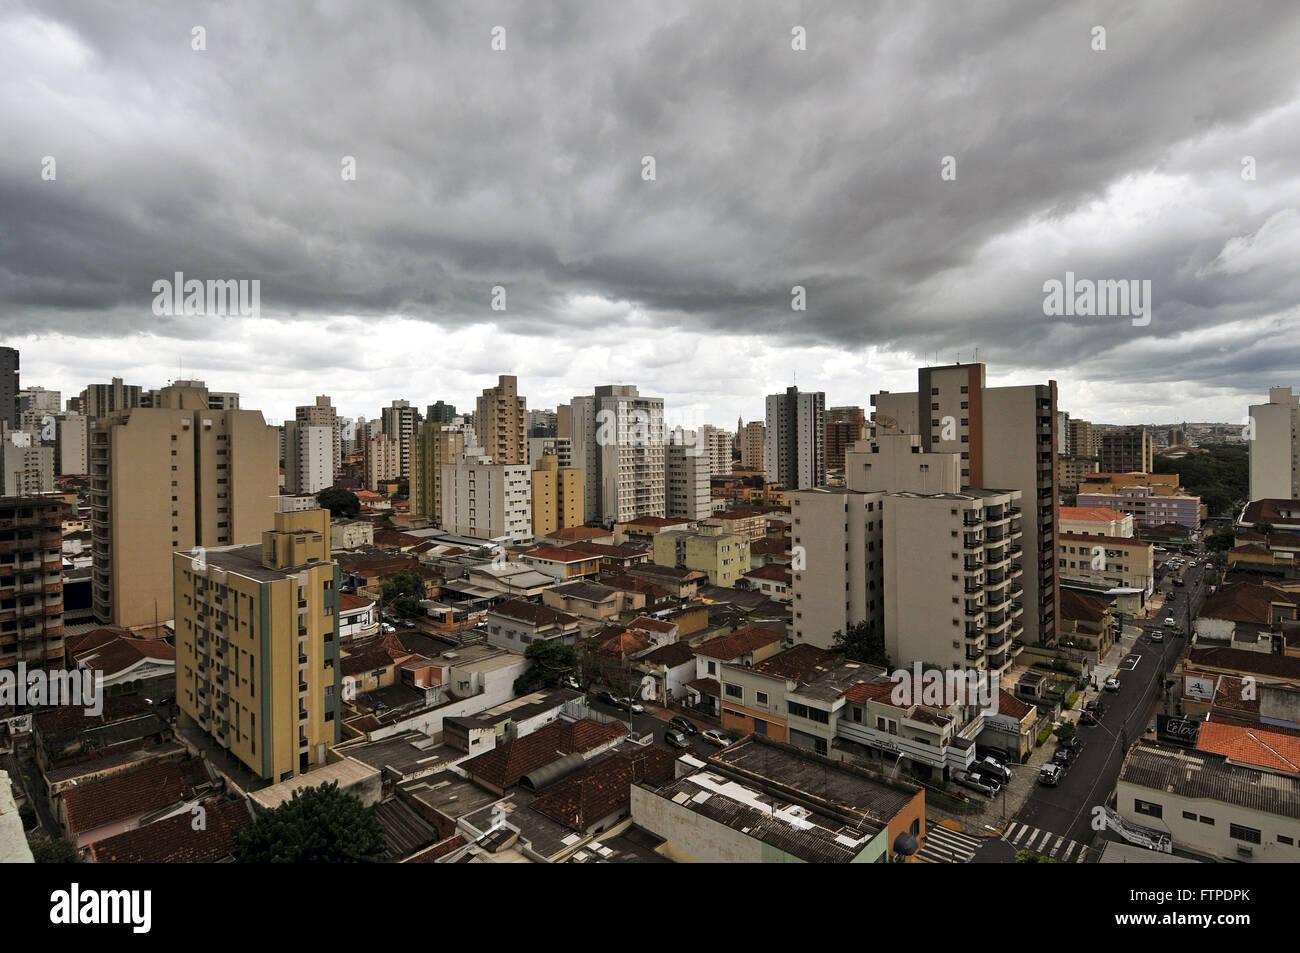 Cloudy sky in the city of Ribeirao Preto - Sao Paulo - Stock Image